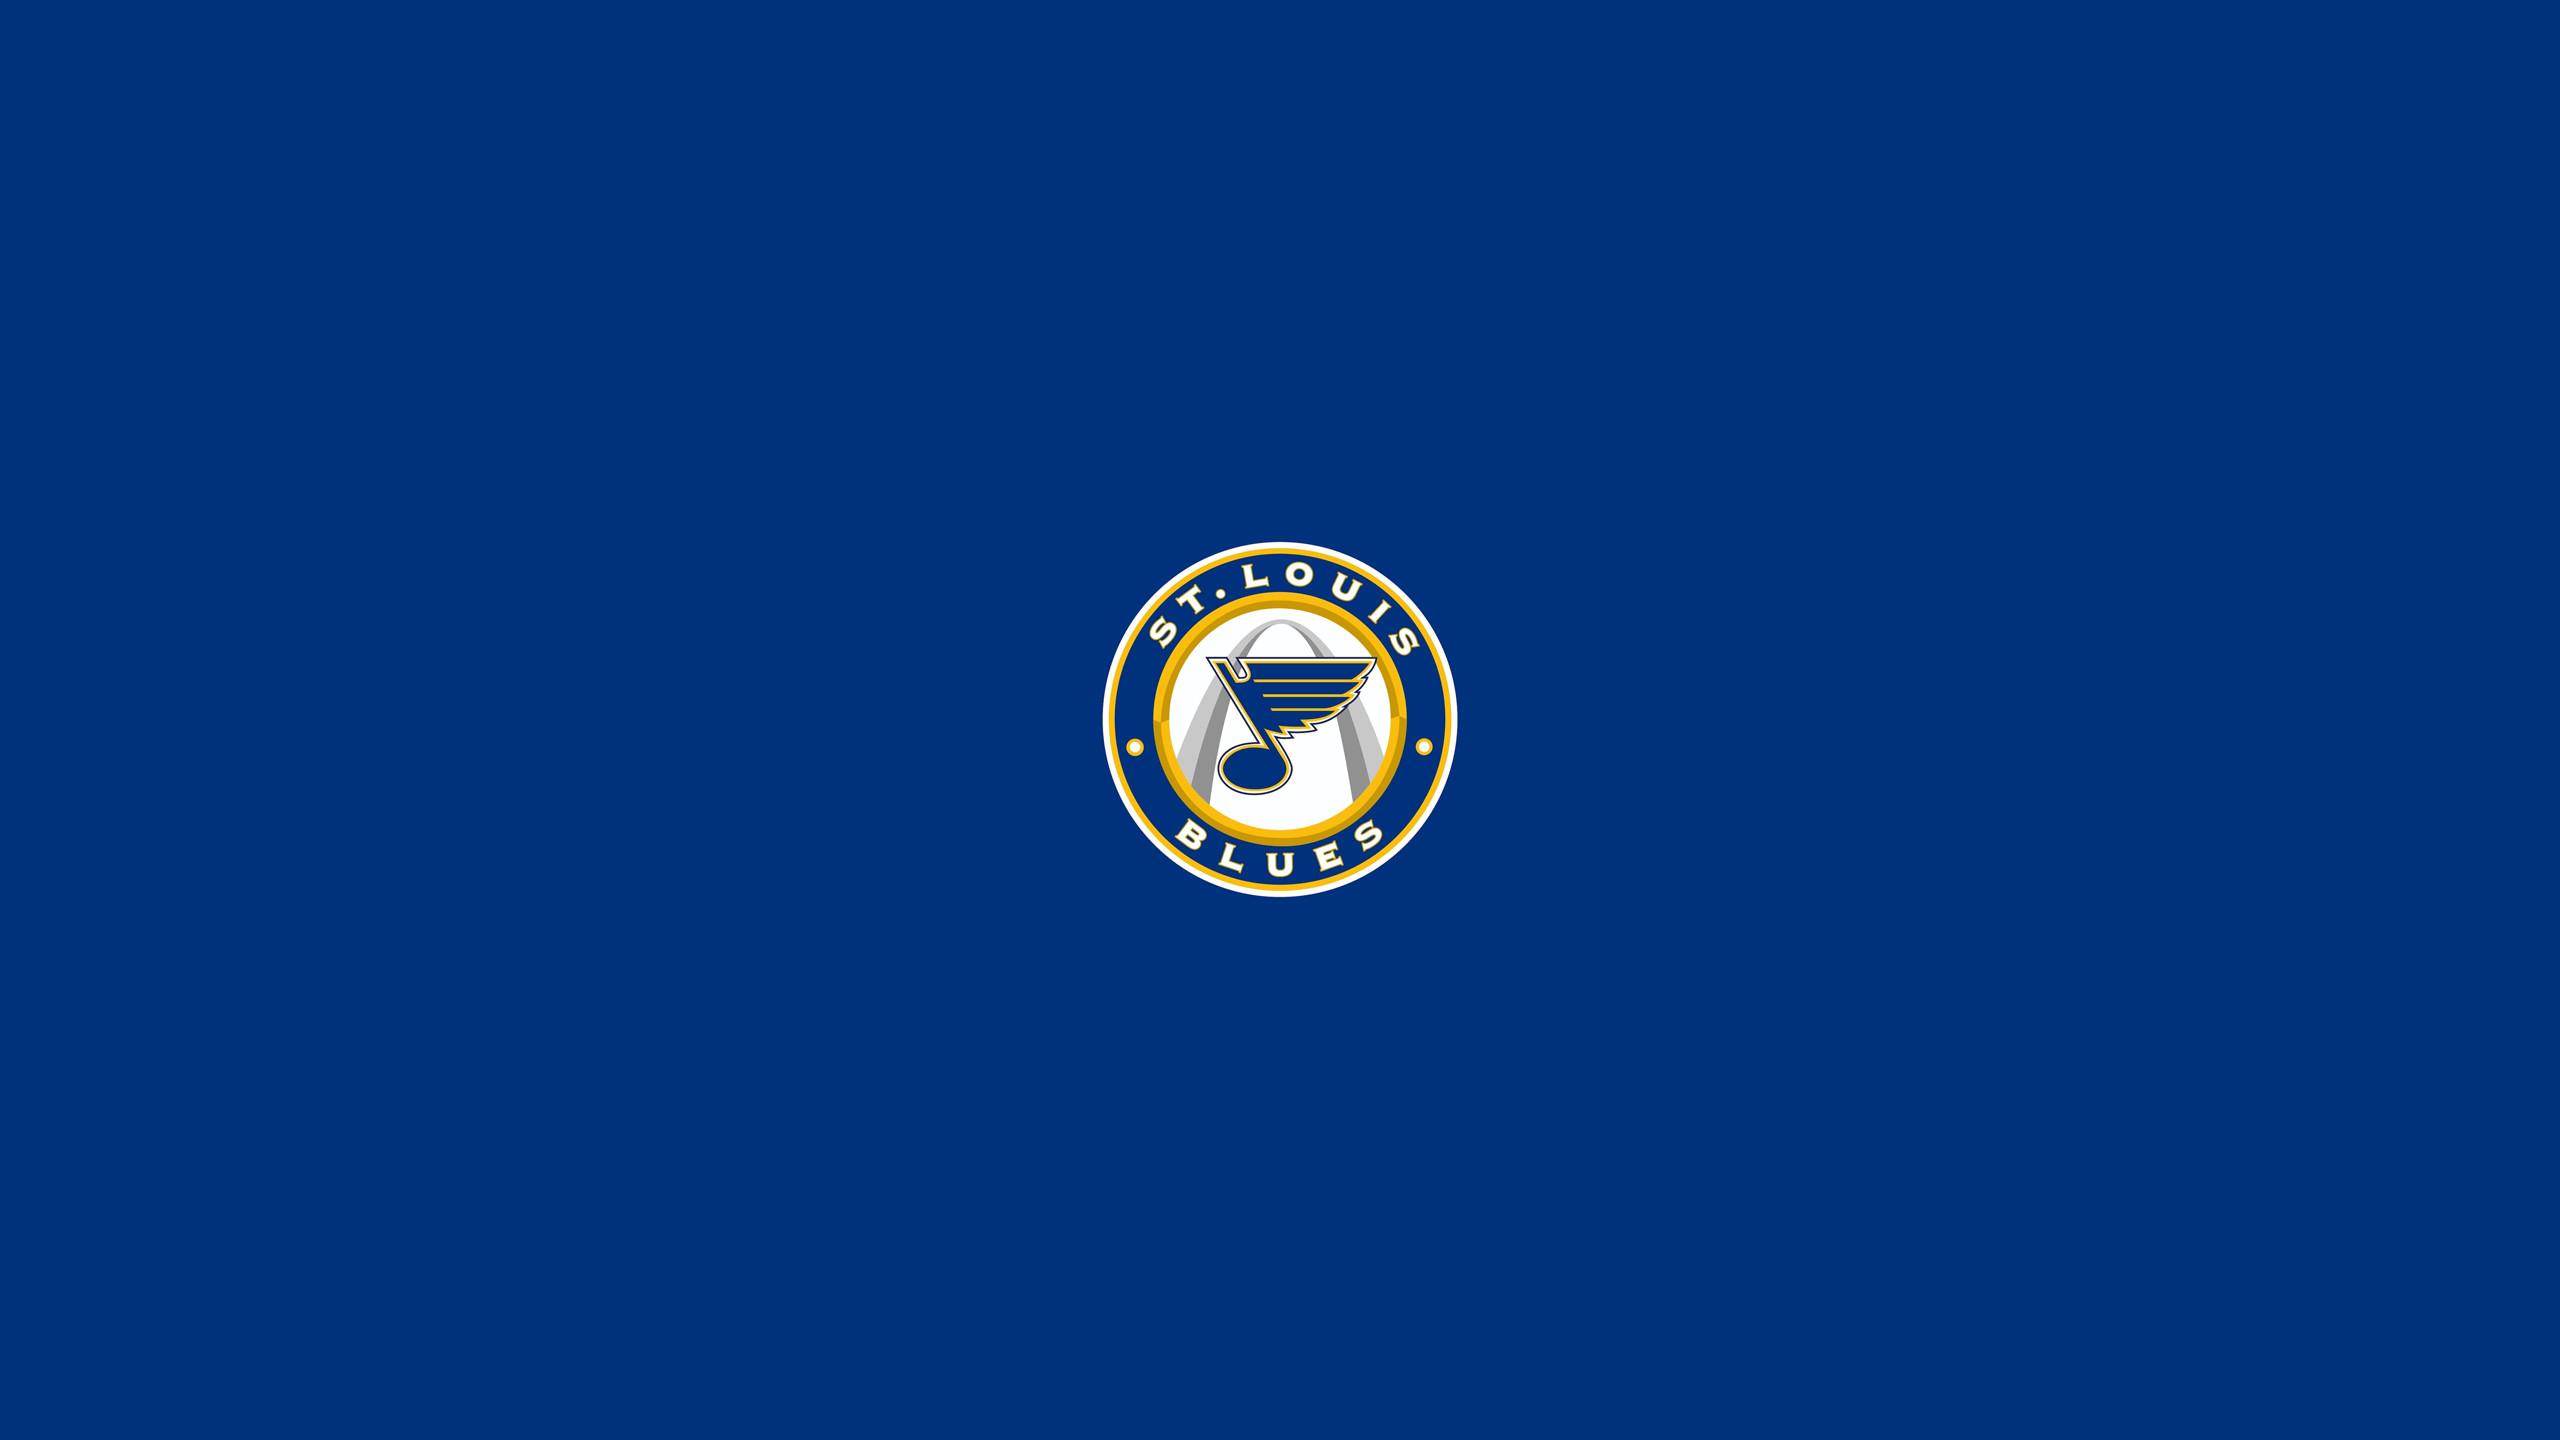 2560x1440 Saint Louis Blues Wallpapers